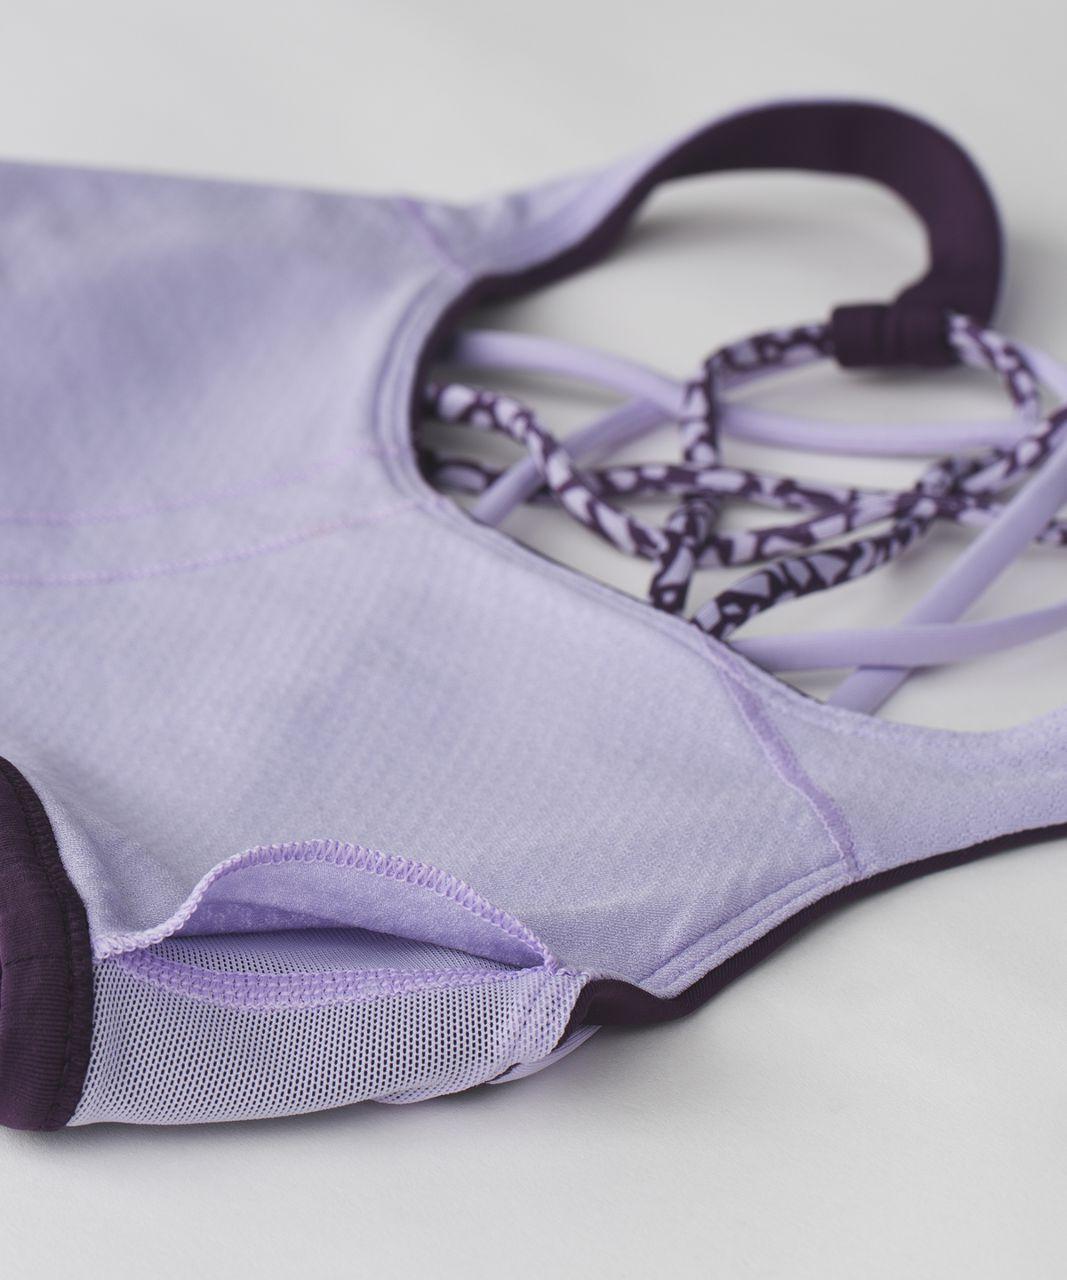 Lululemon Free To Be Bra (Wild) - Deep Zinfandel / Lilac / Miss Mosaic Lilac Deep Zinfandel